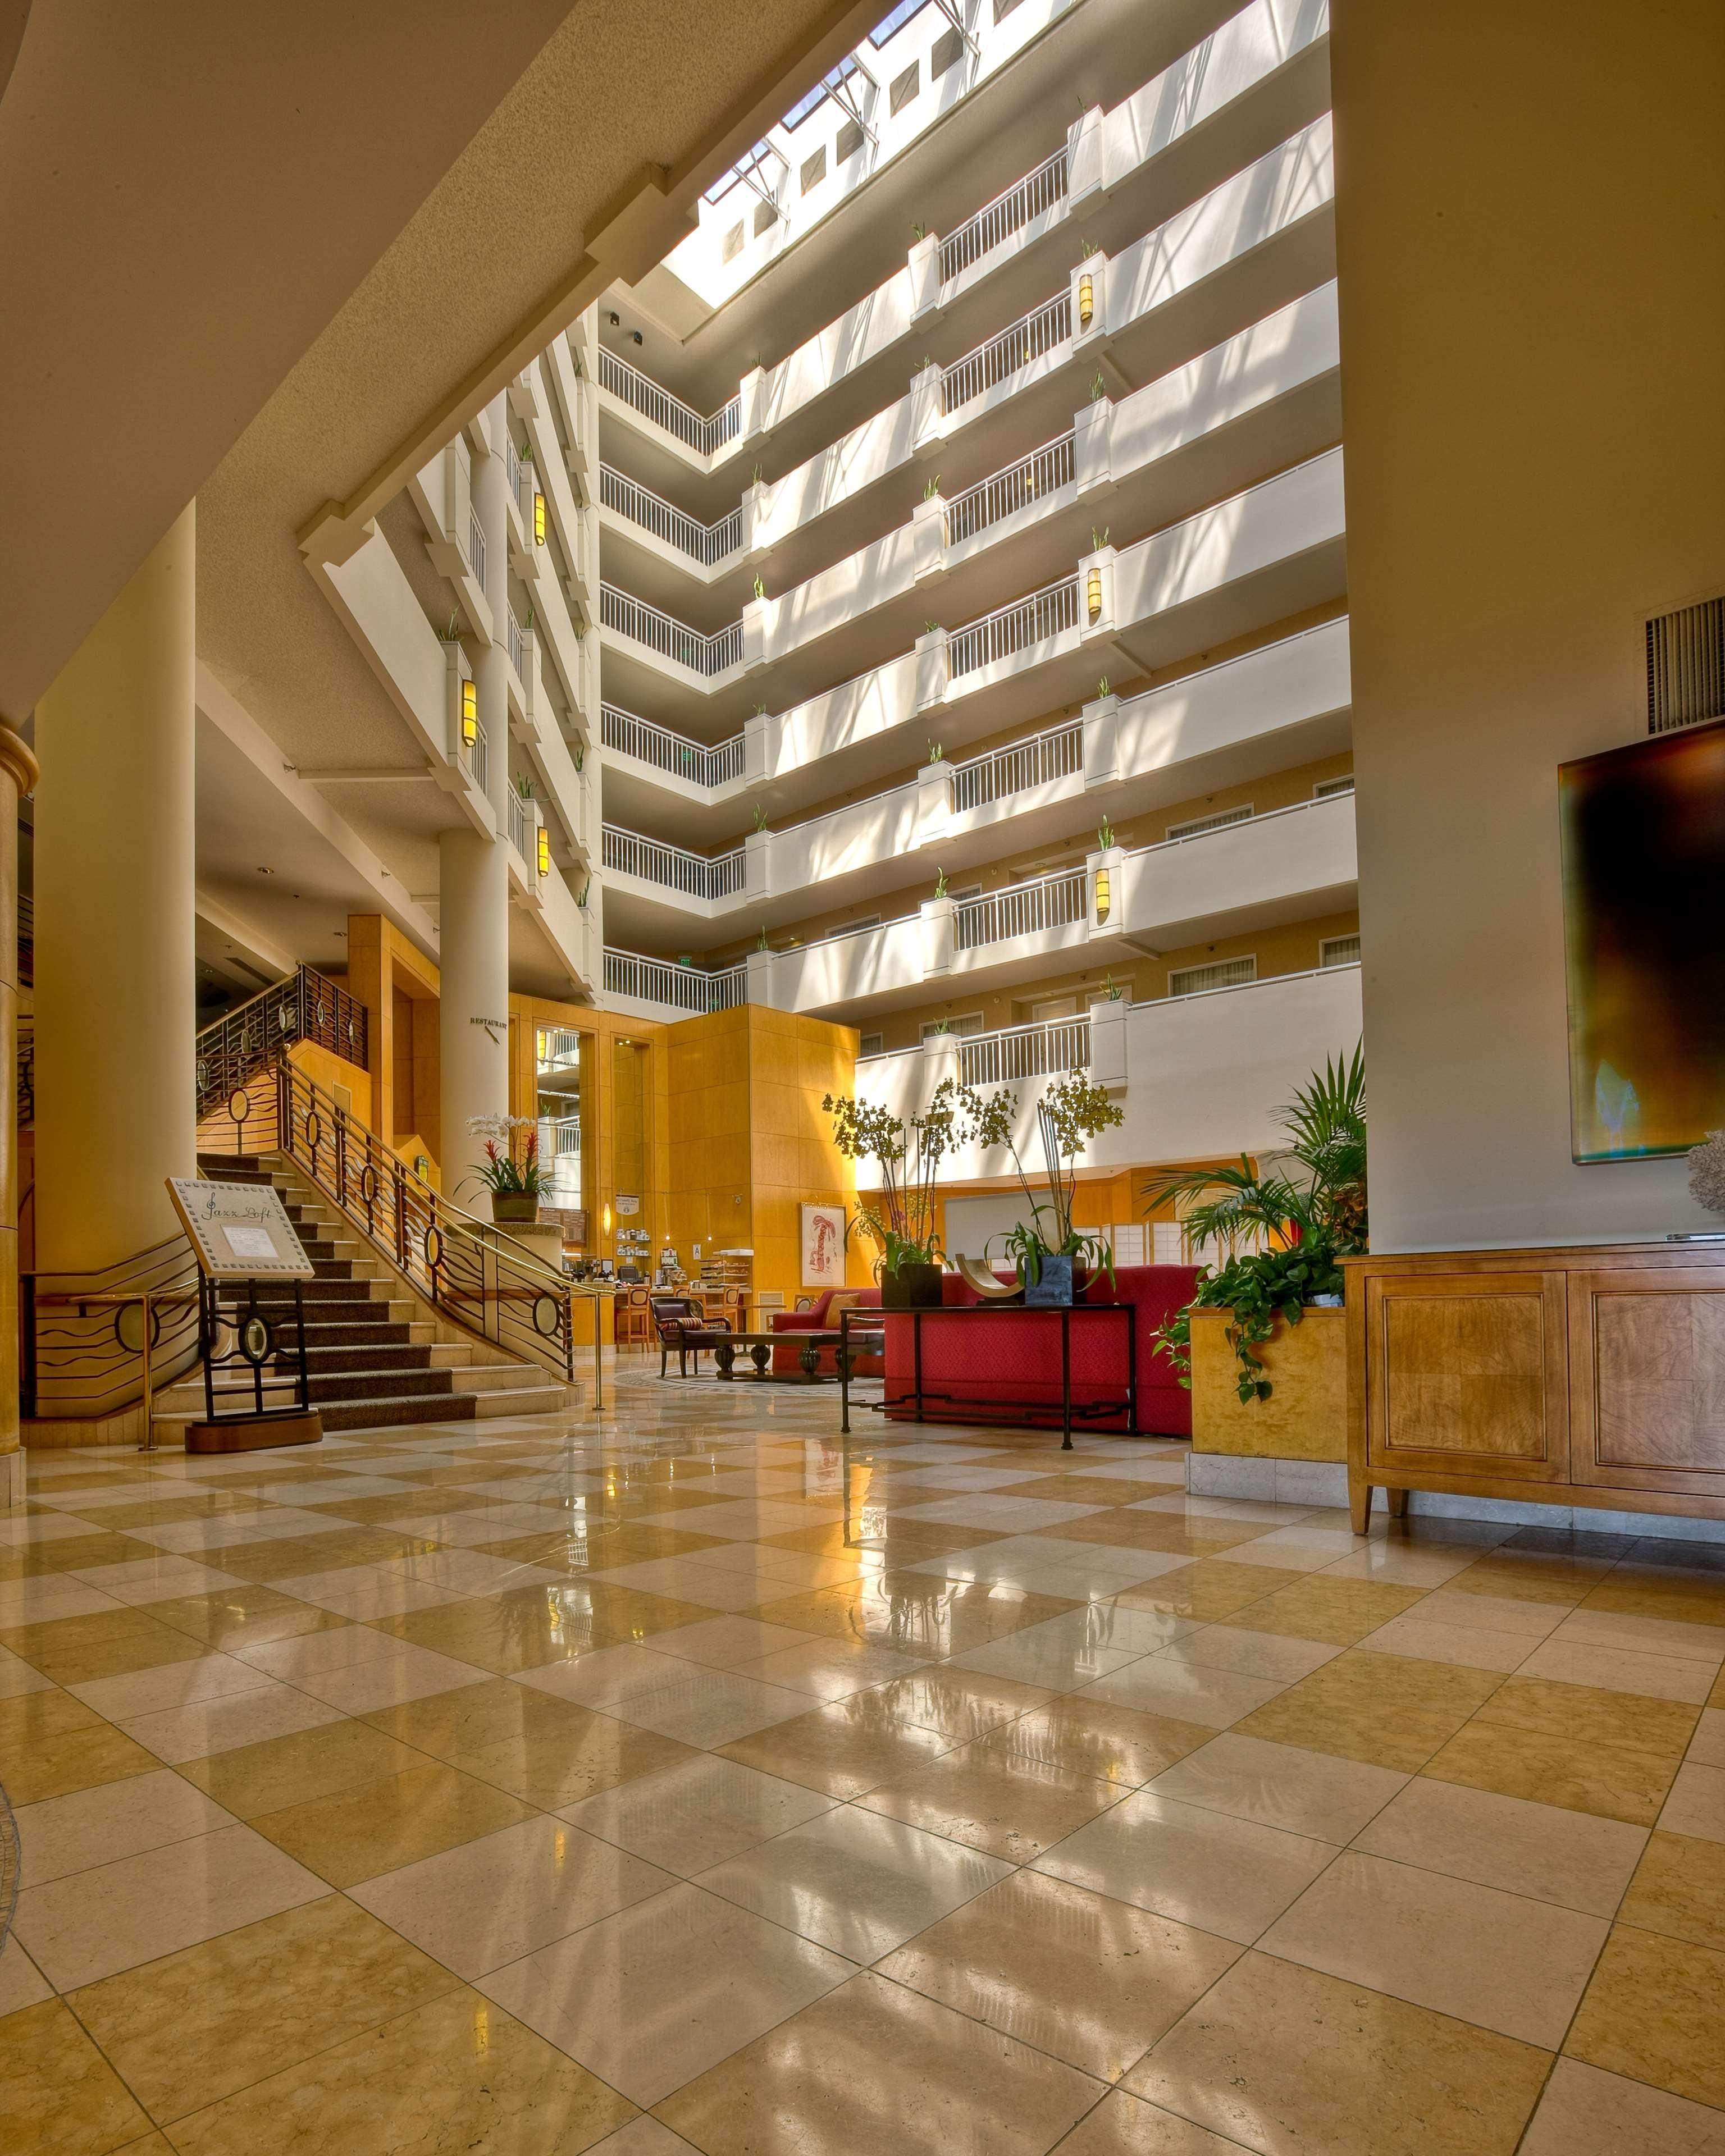 DoubleTree Suites by Hilton Hotel Santa Monica image 2